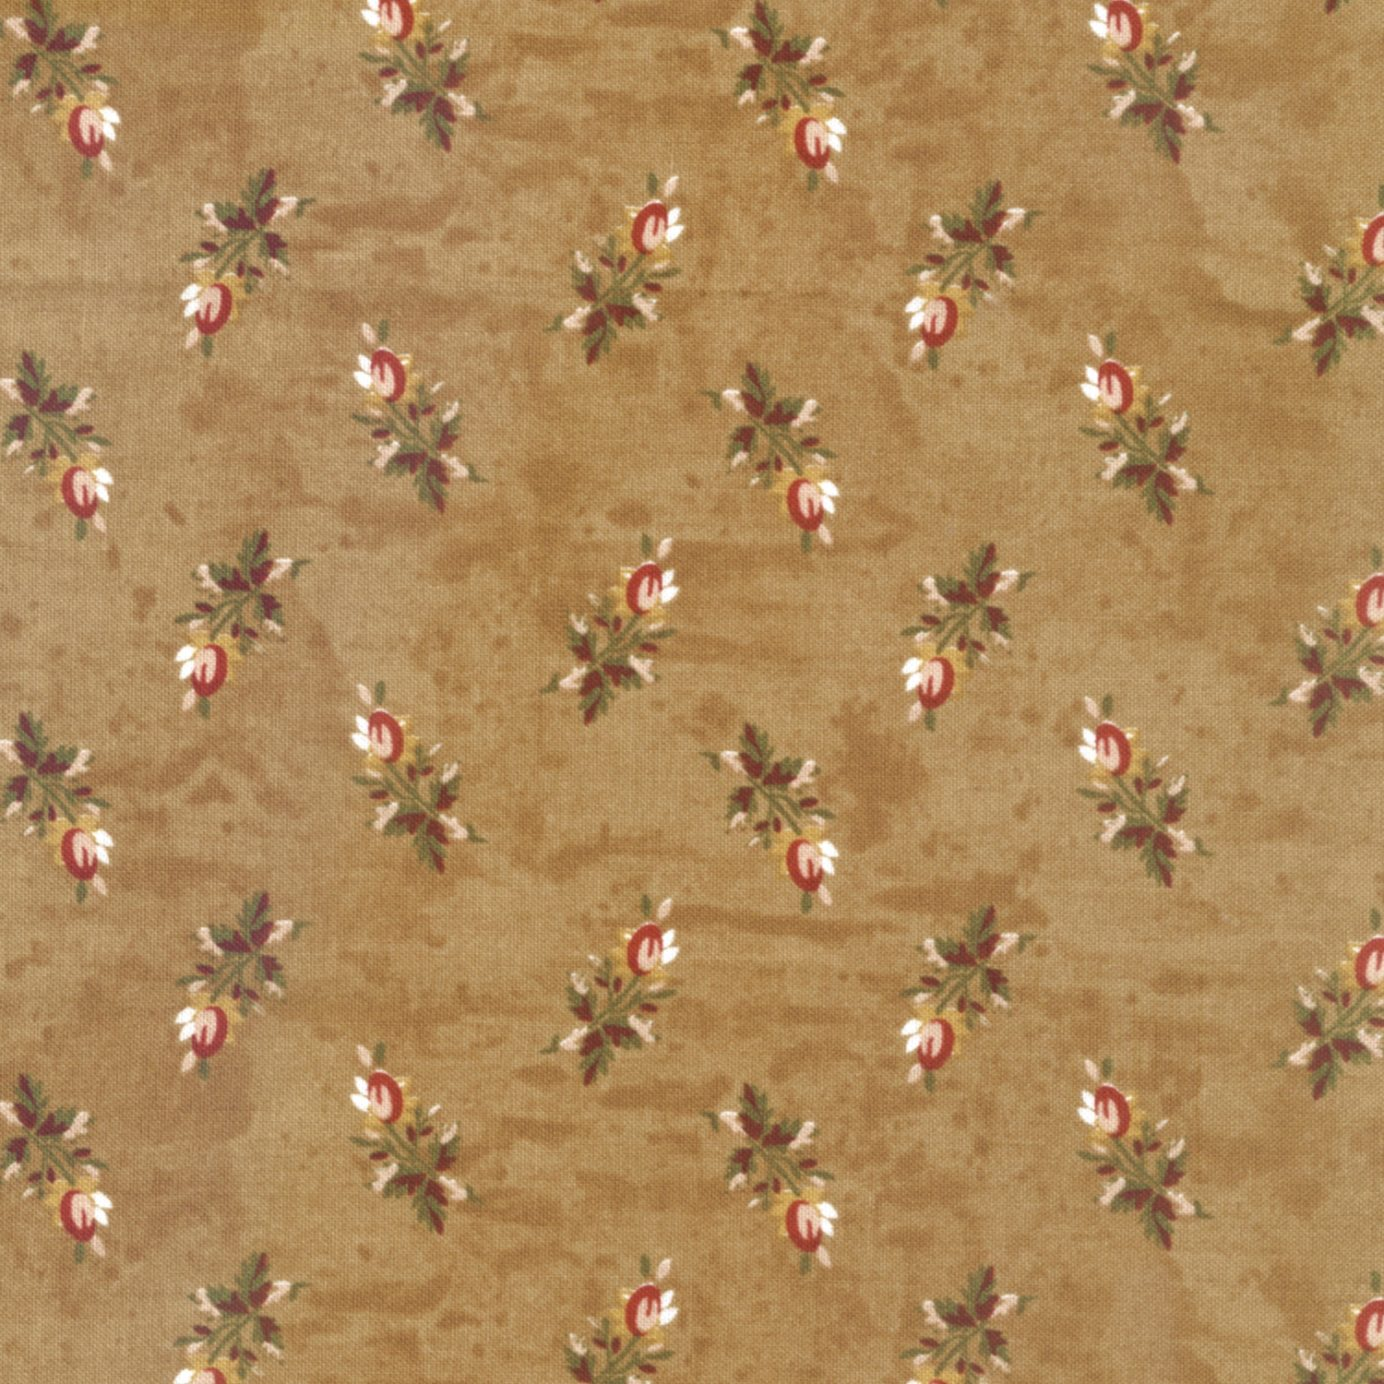 jefferson-floral-brown-c6161-brown